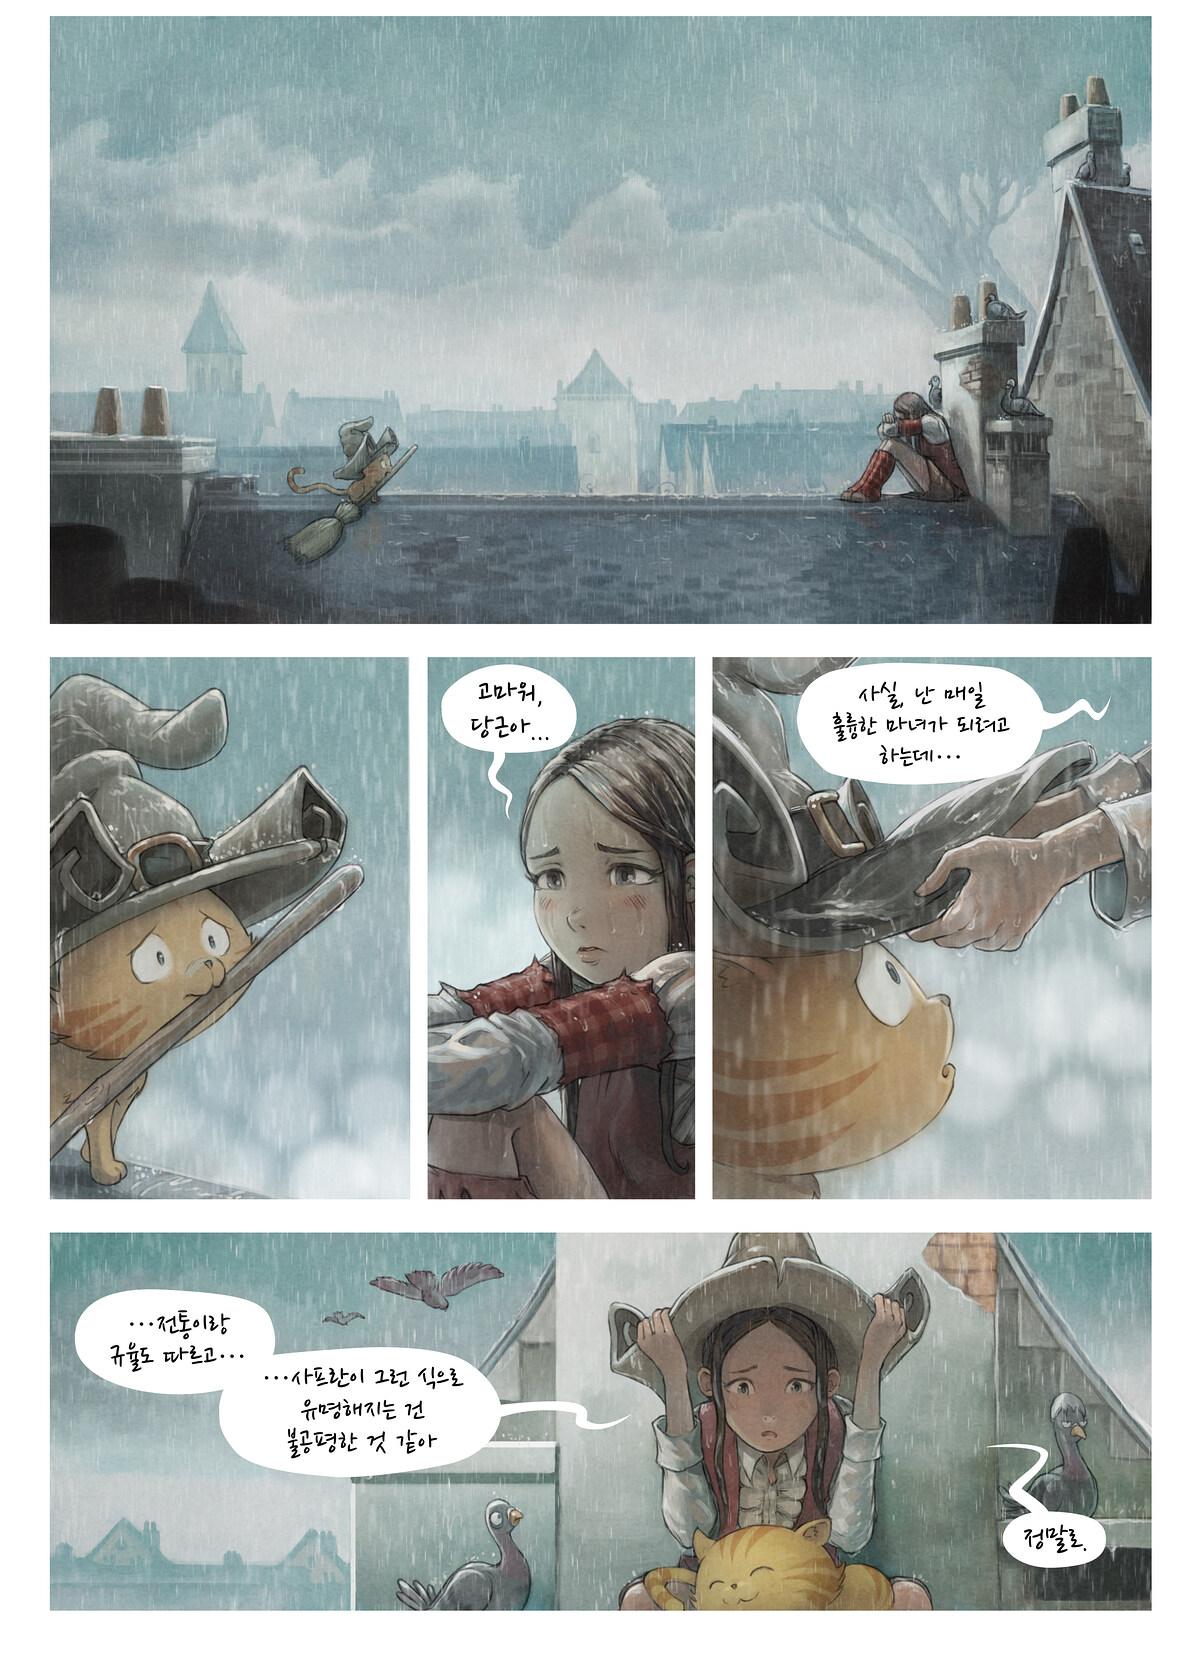 A webcomic page of Pepper&Carrot, 에피소드 23 [kr], 페이지 2